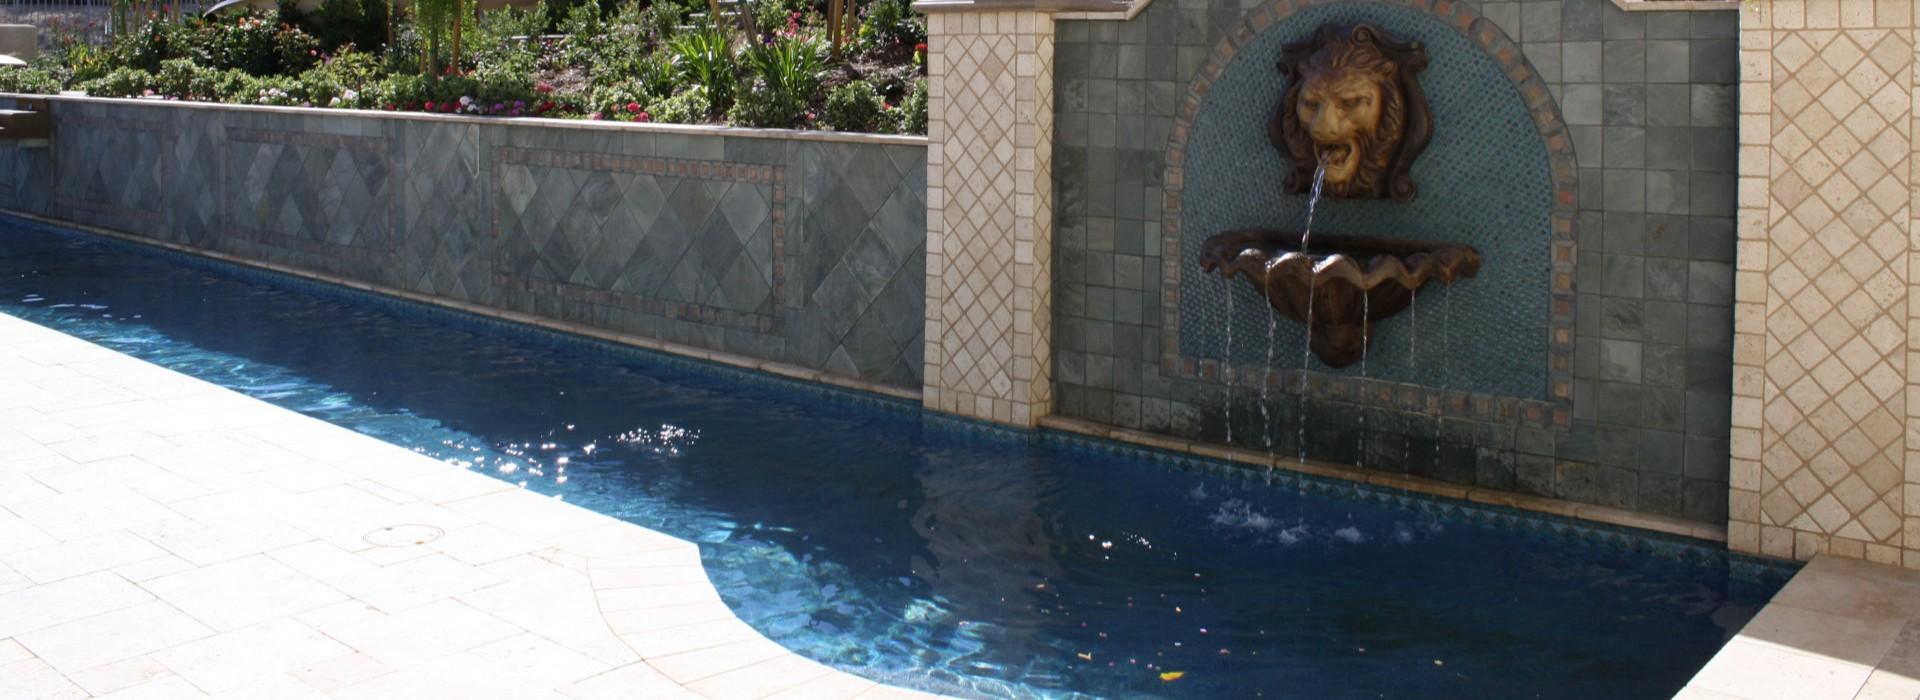 elegant-water-park-backyard-banner-1